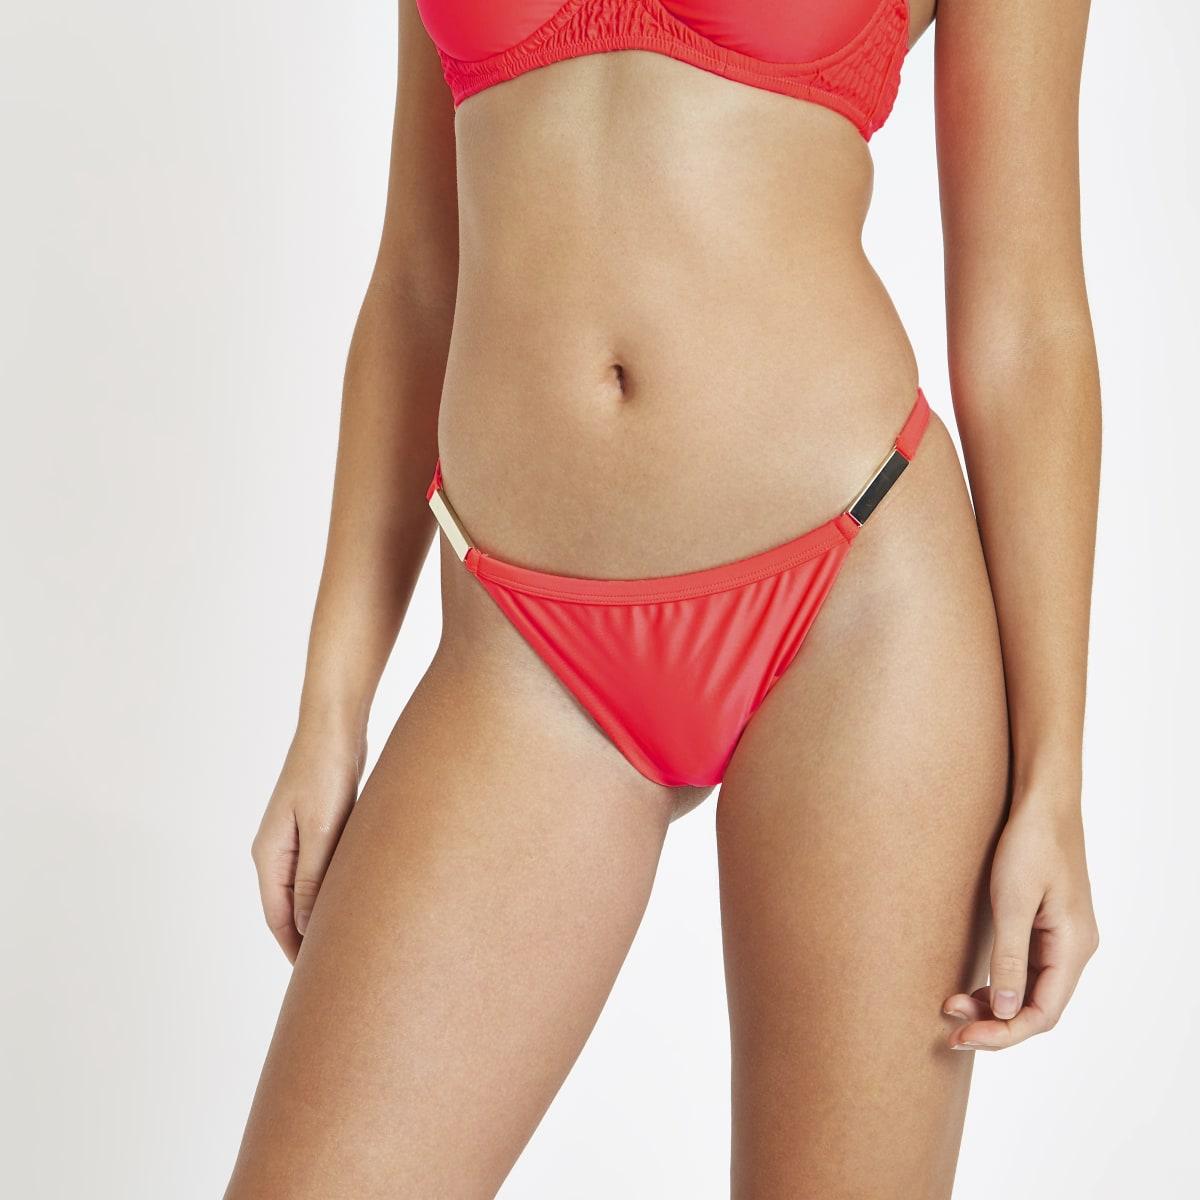 Felkoraalrood hoog opgesneden bikinibroekje